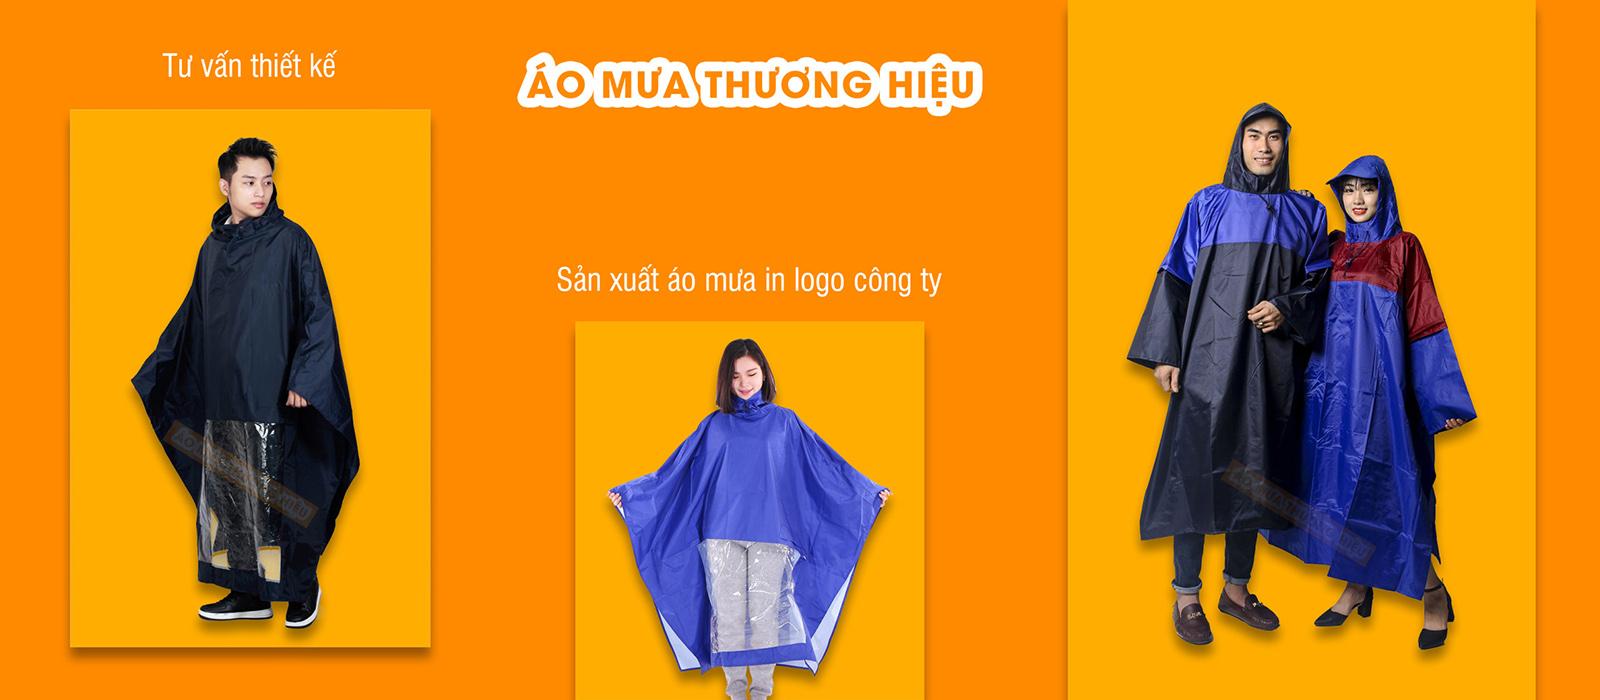 Banner ao mua thuong hieu 04